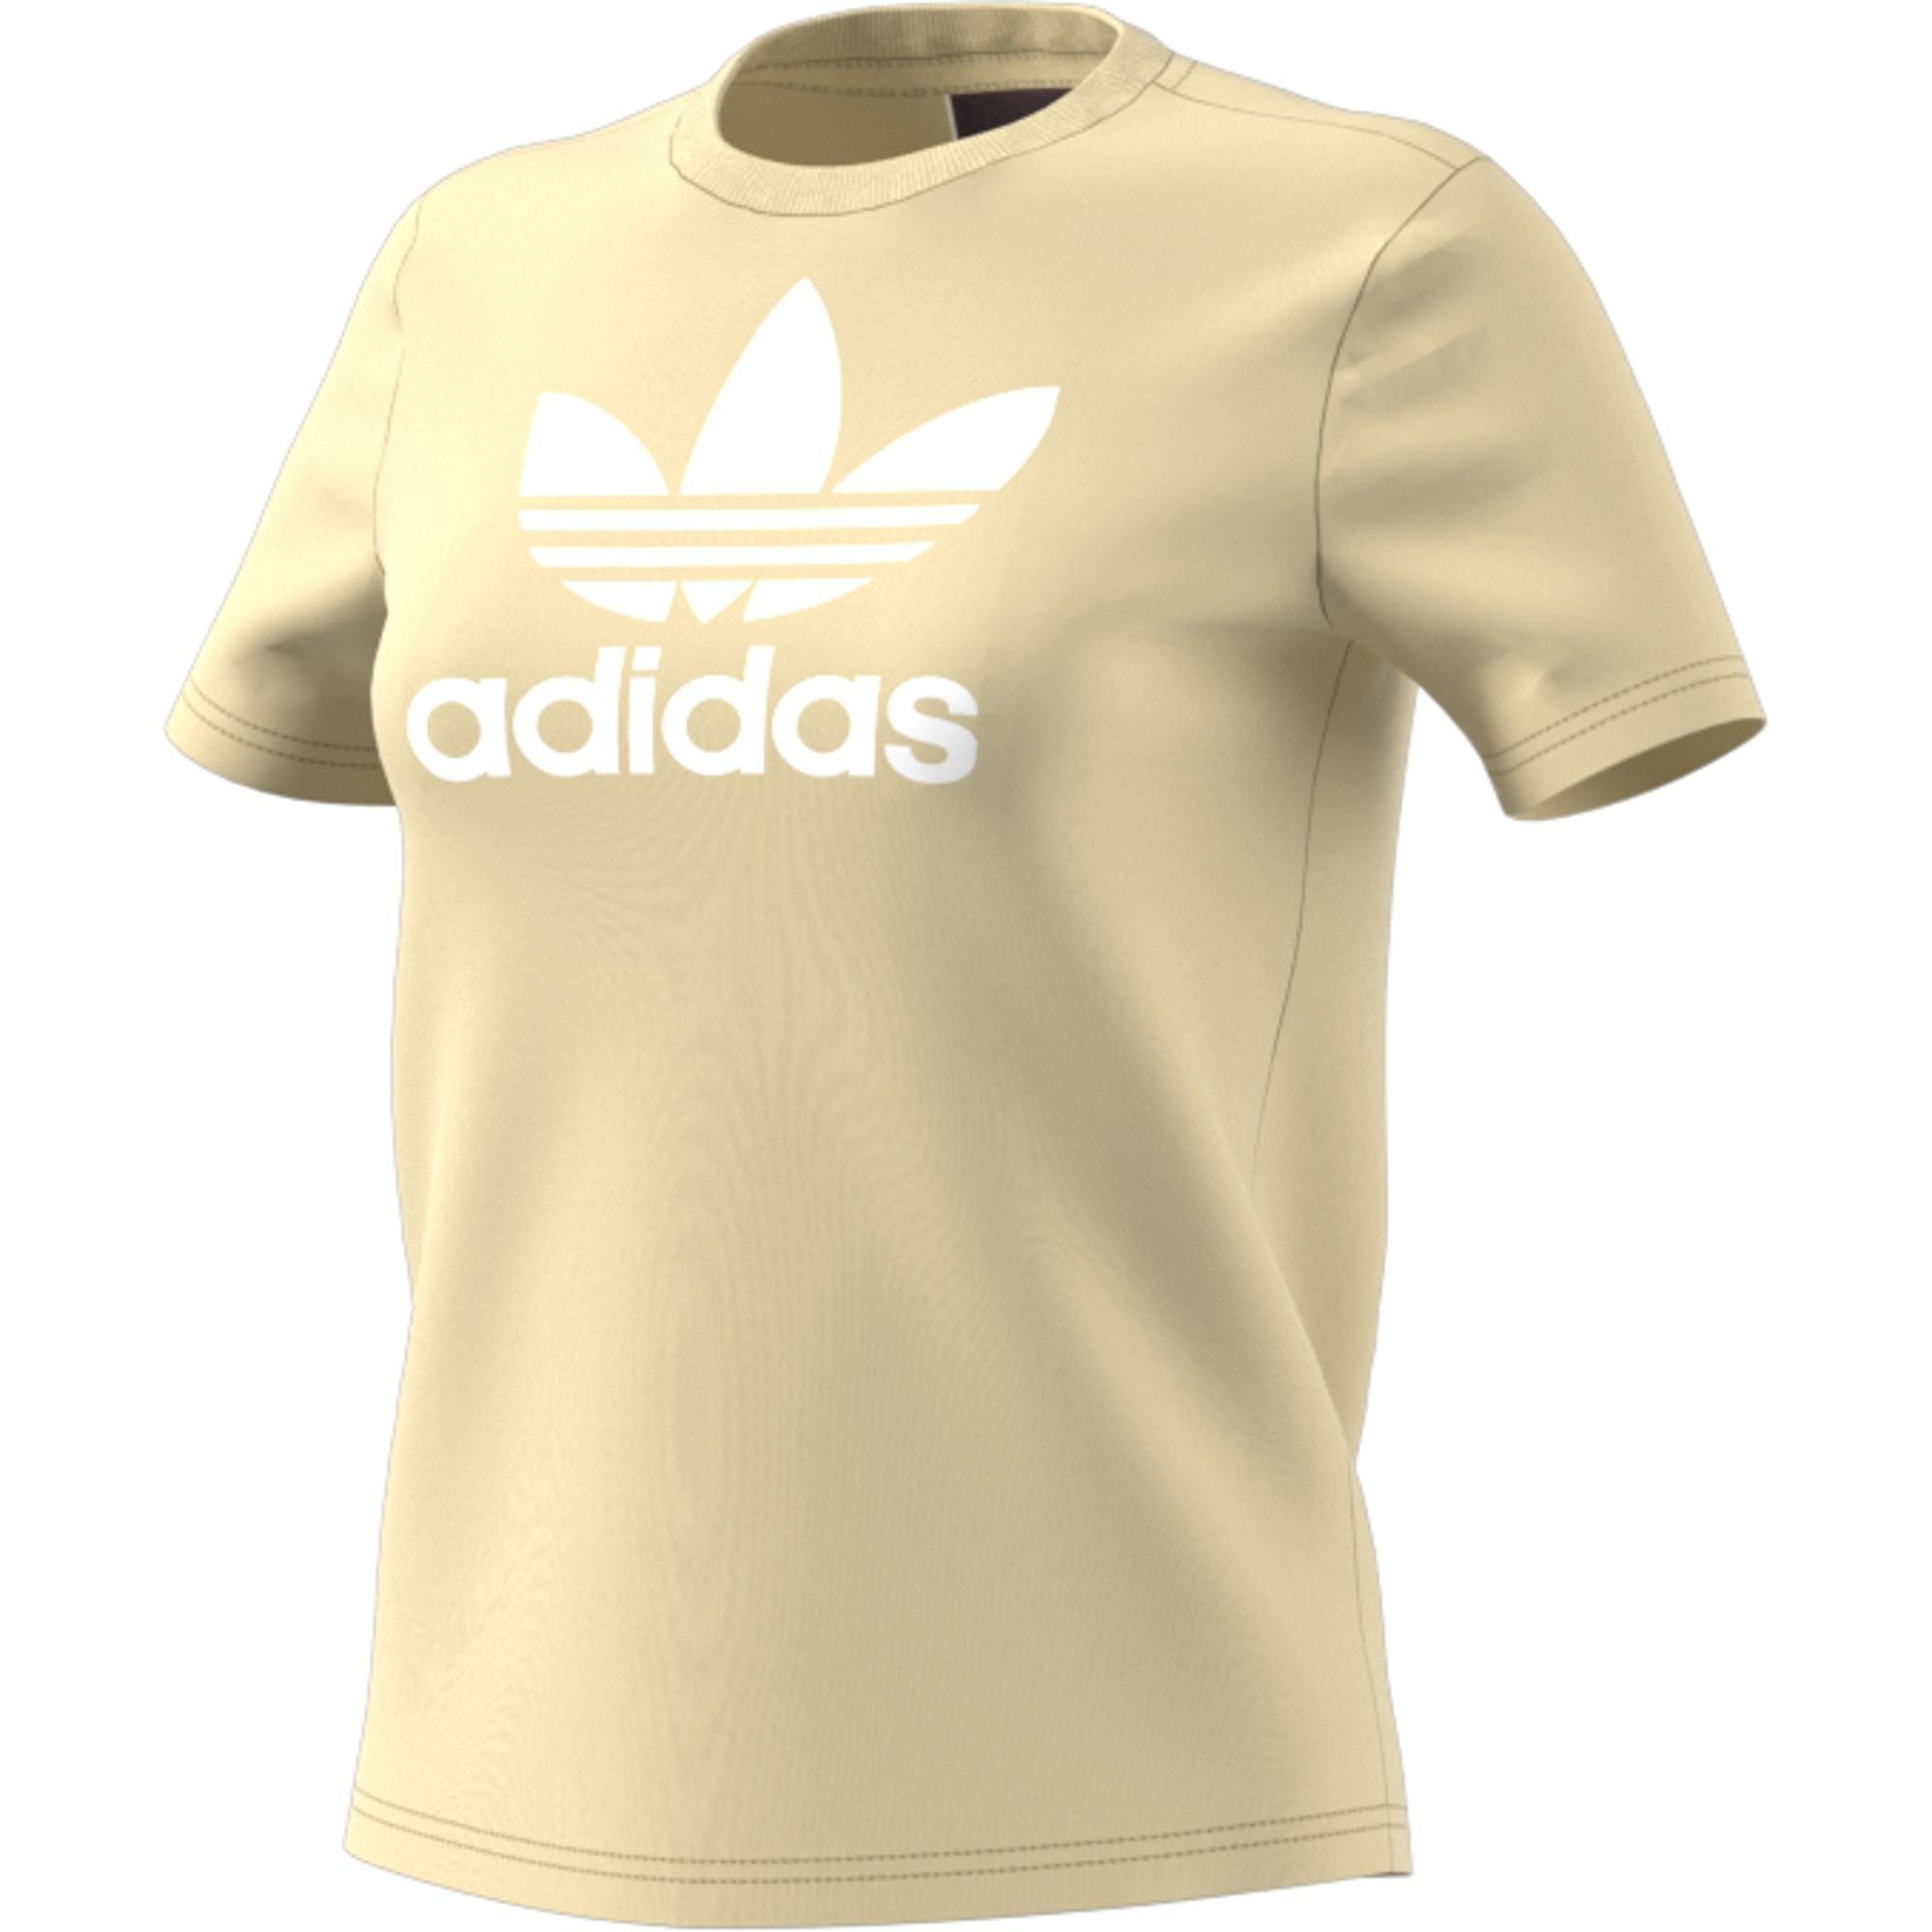 Trefoil Adidas Tee Amarillo Deportes Moya Mujer Blanco Camiseta O58PSnwqP